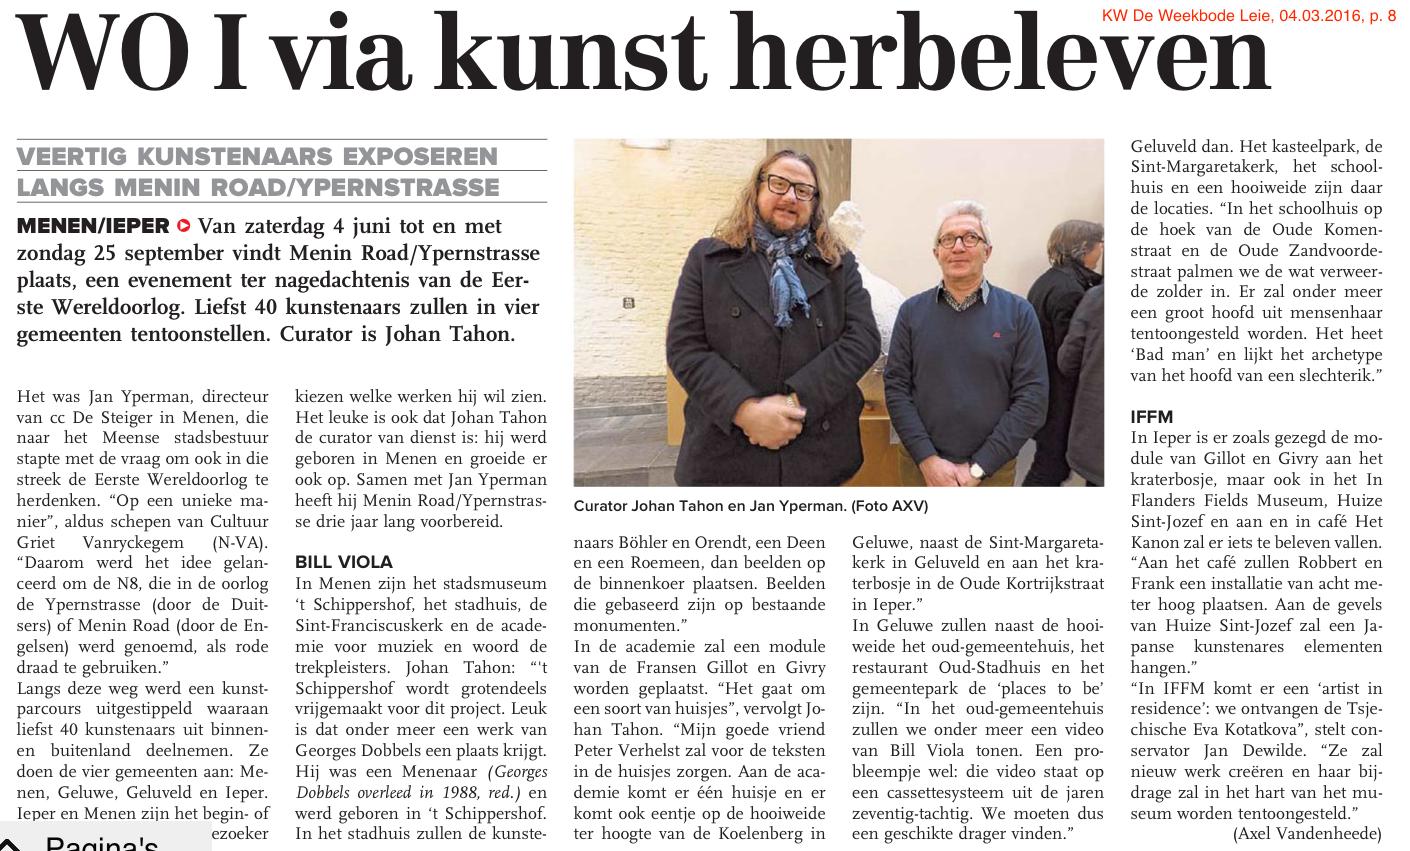 KW De Weekbode Leie, 04.03.2016